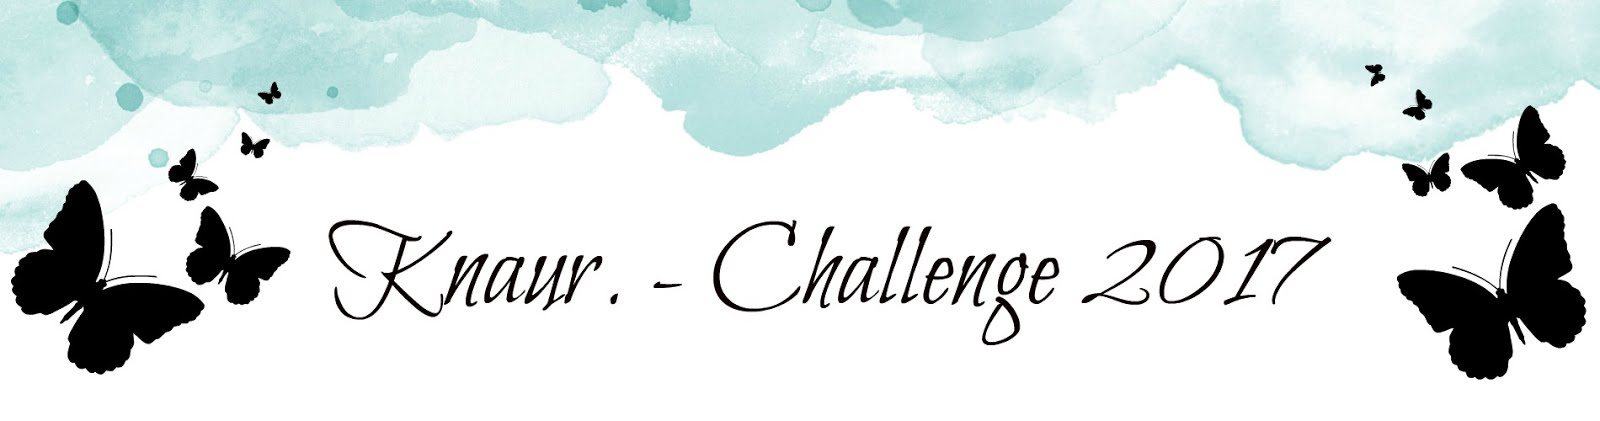 Knaur Challenge 2017